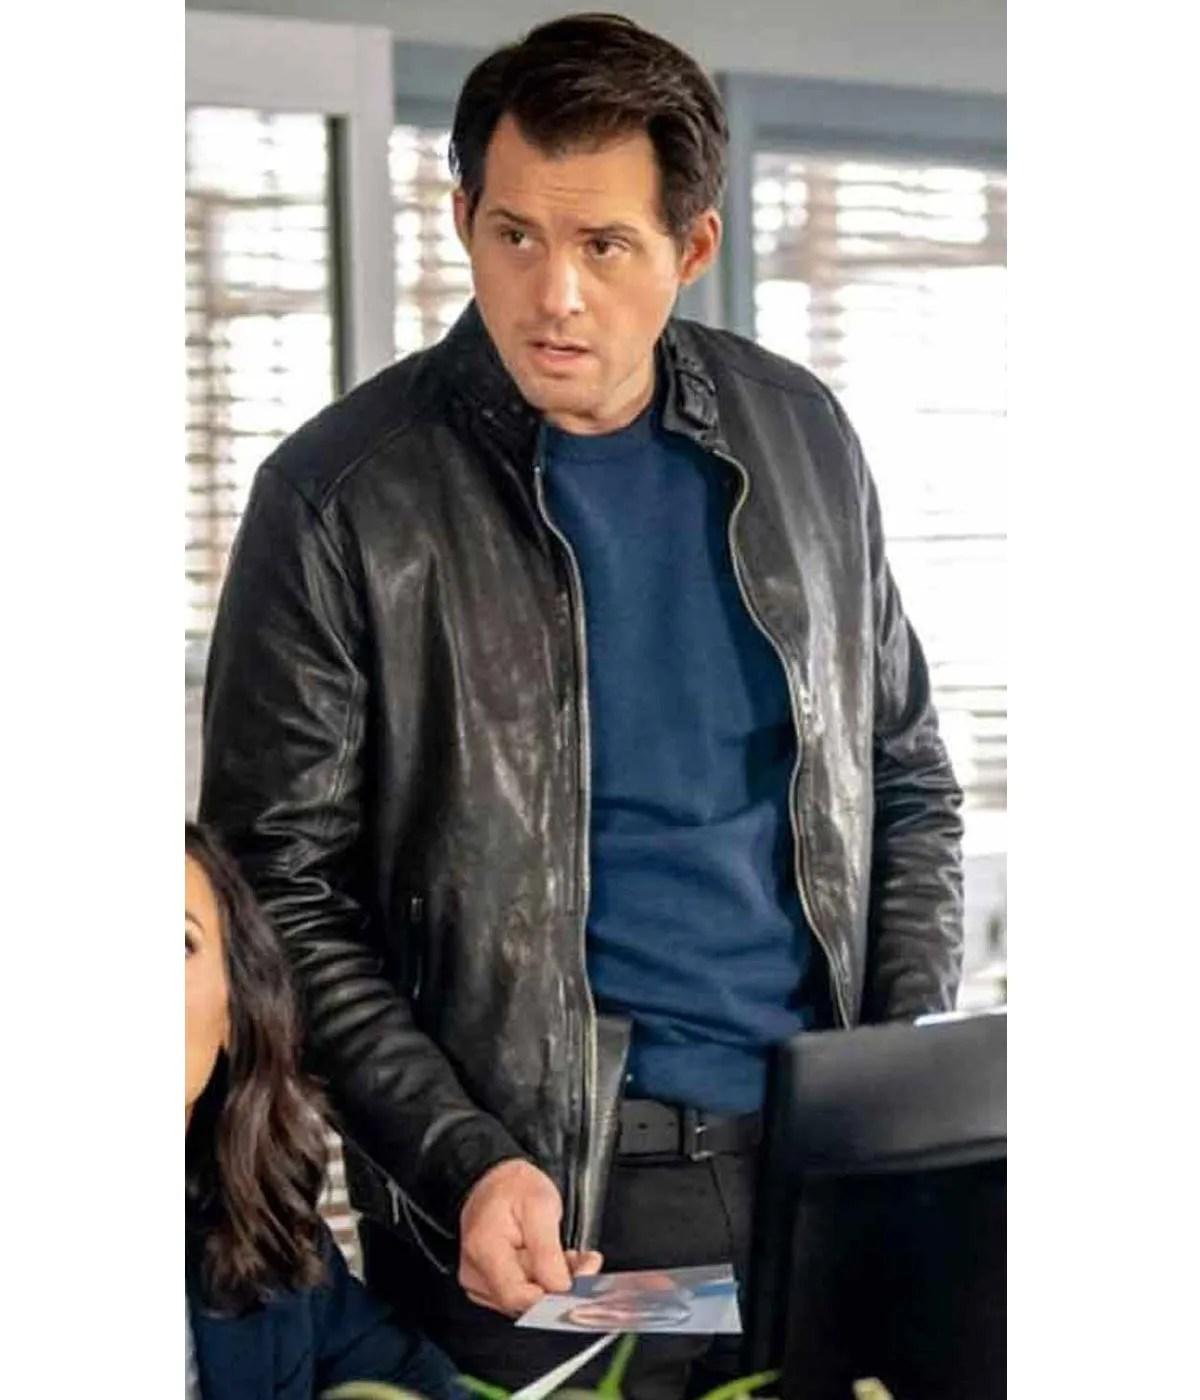 kristoffer-polaha-mystery-101-leather-jacket